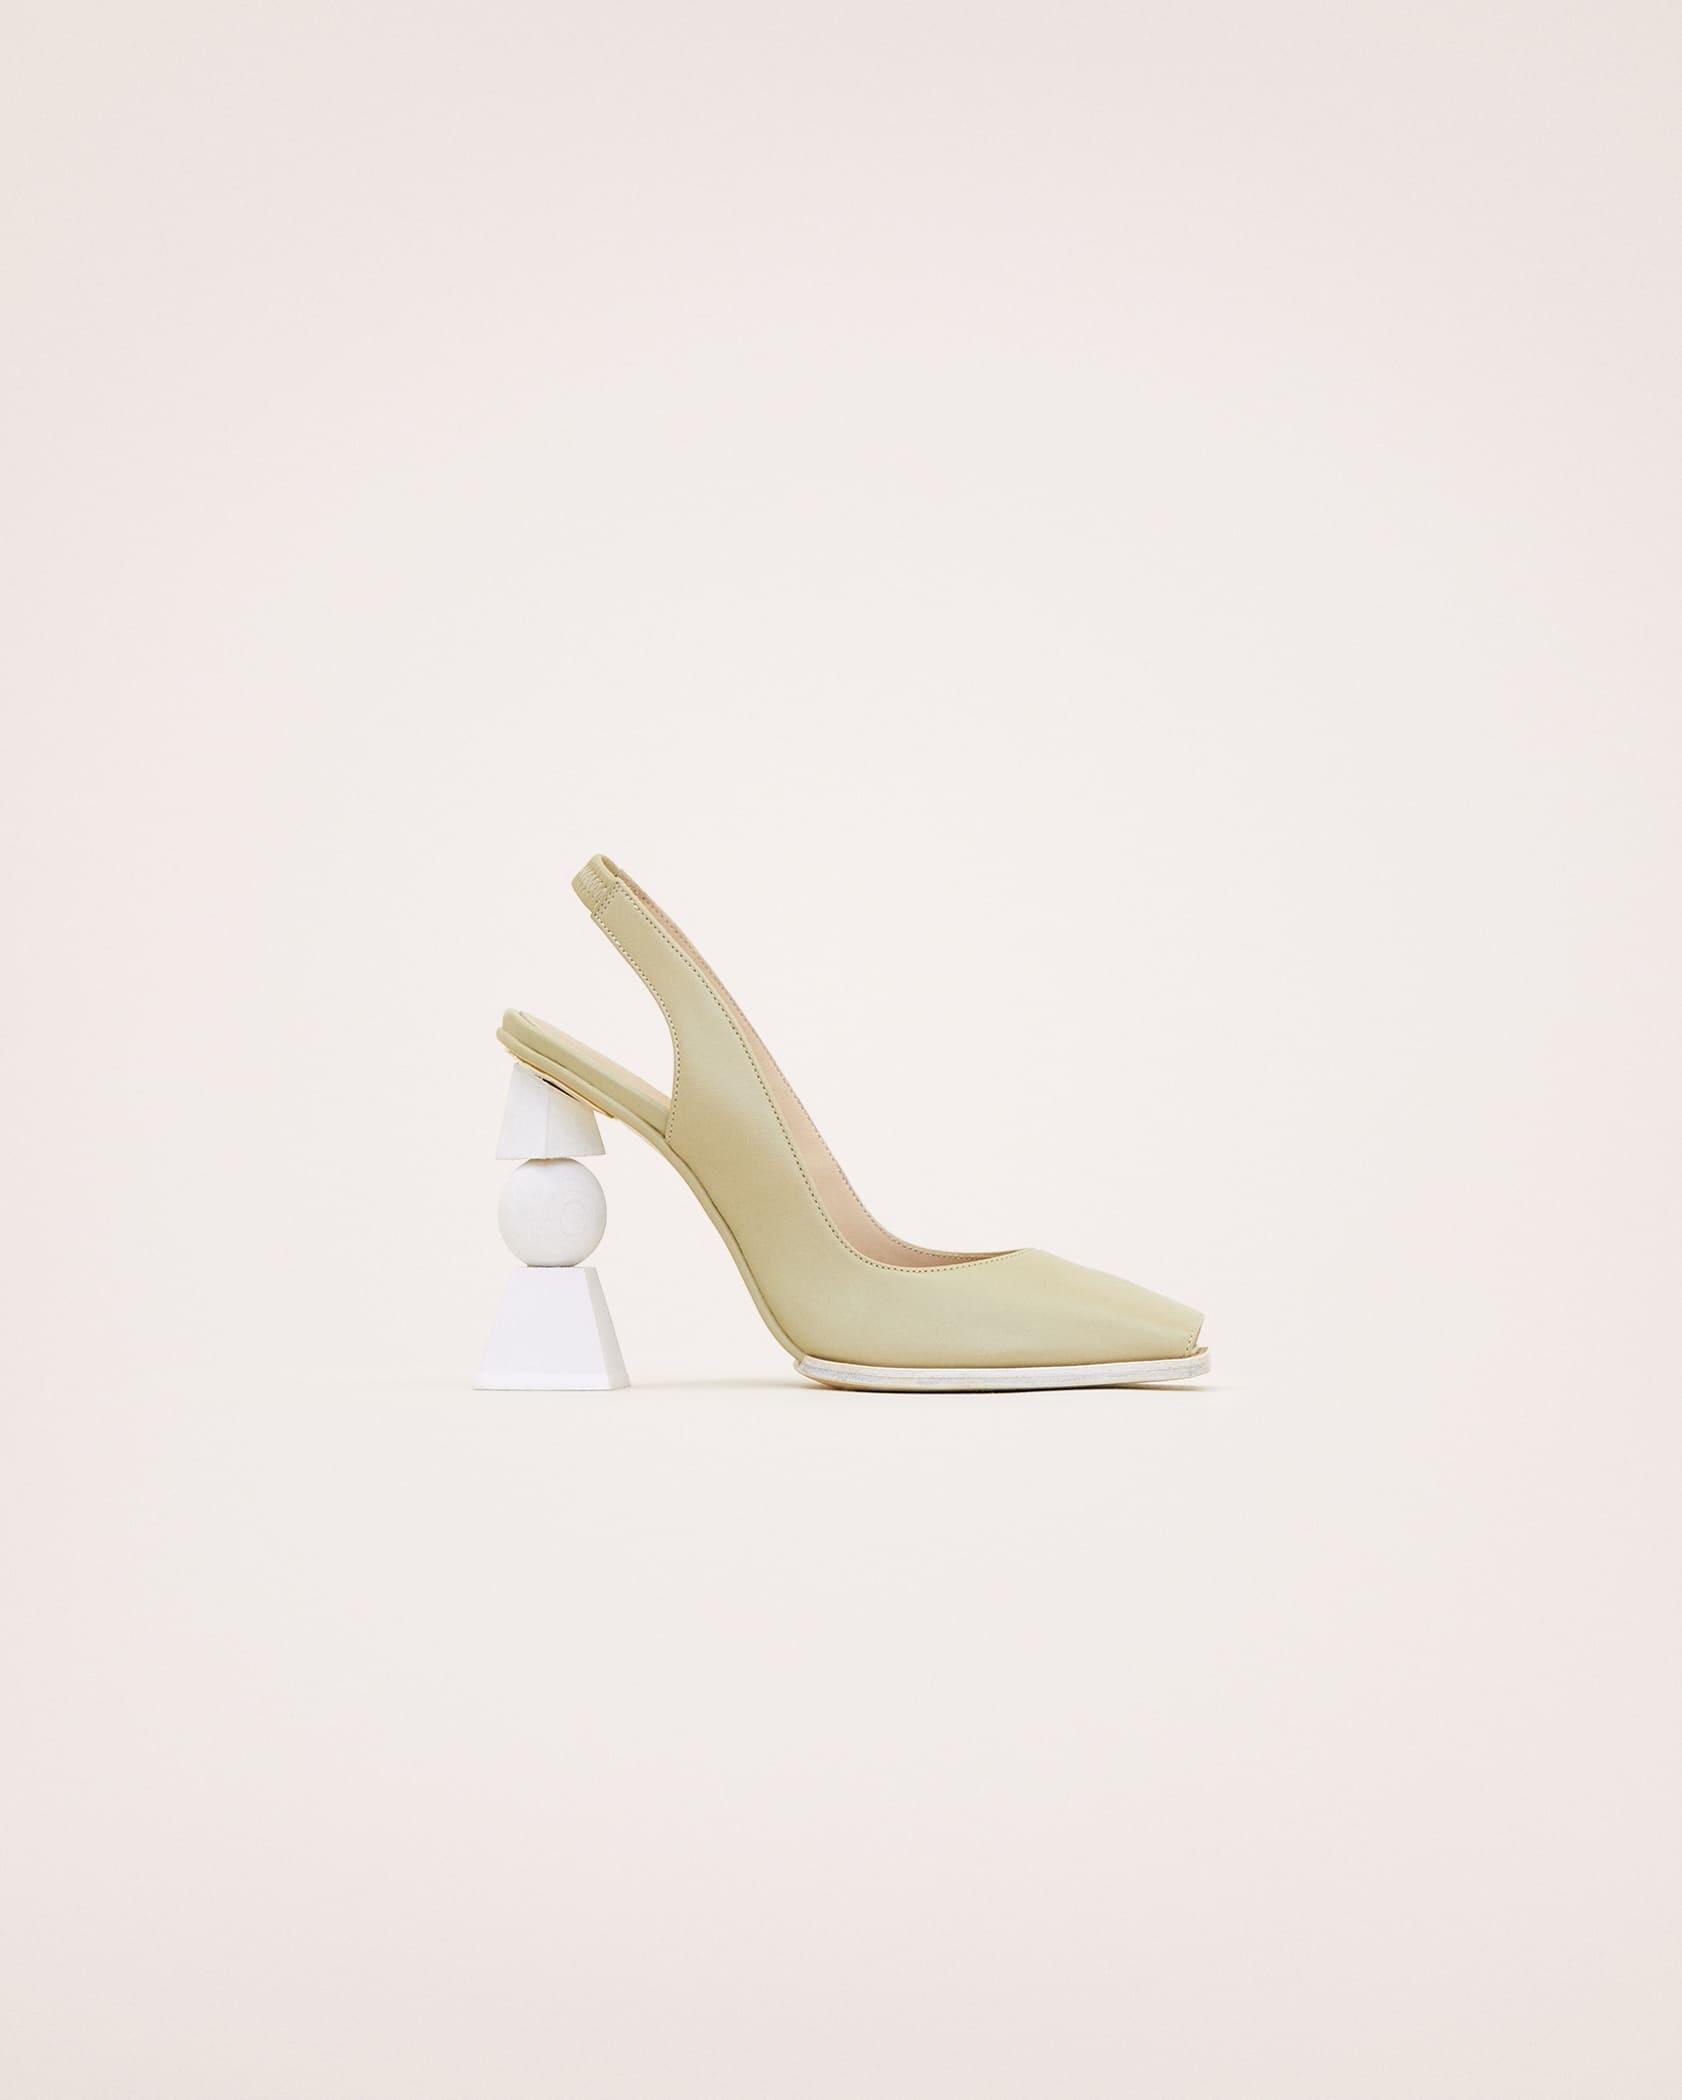 Les chaussures Valerie